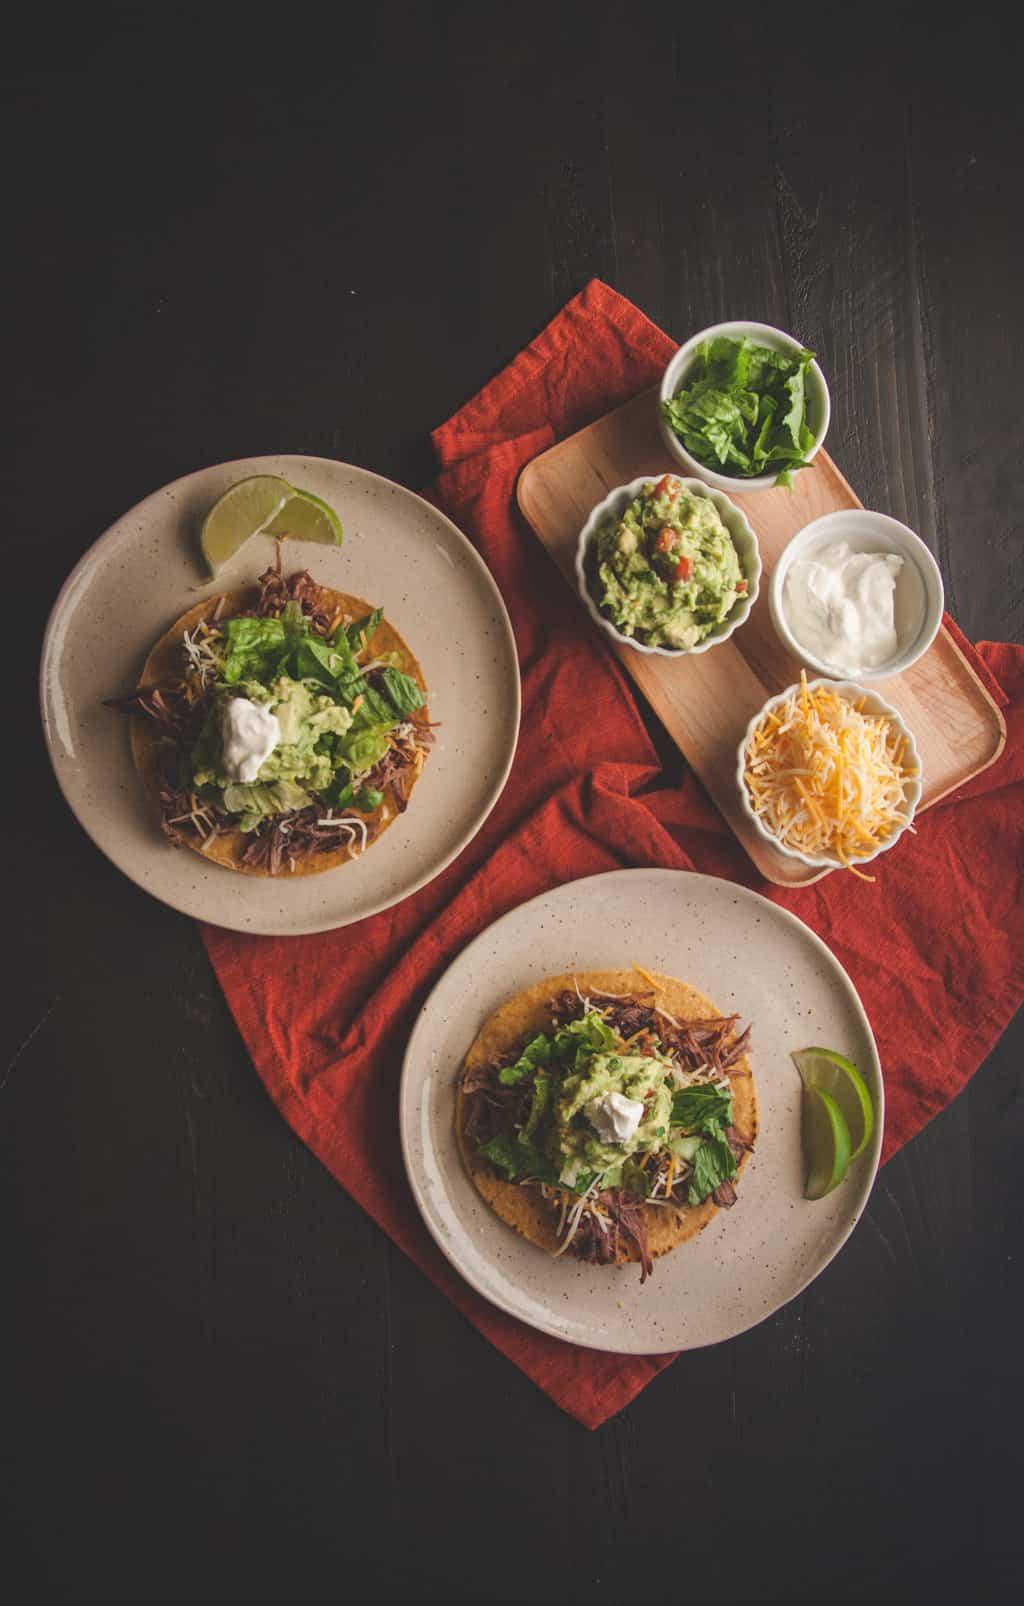 Shredded beef tostadas from @sweetphi